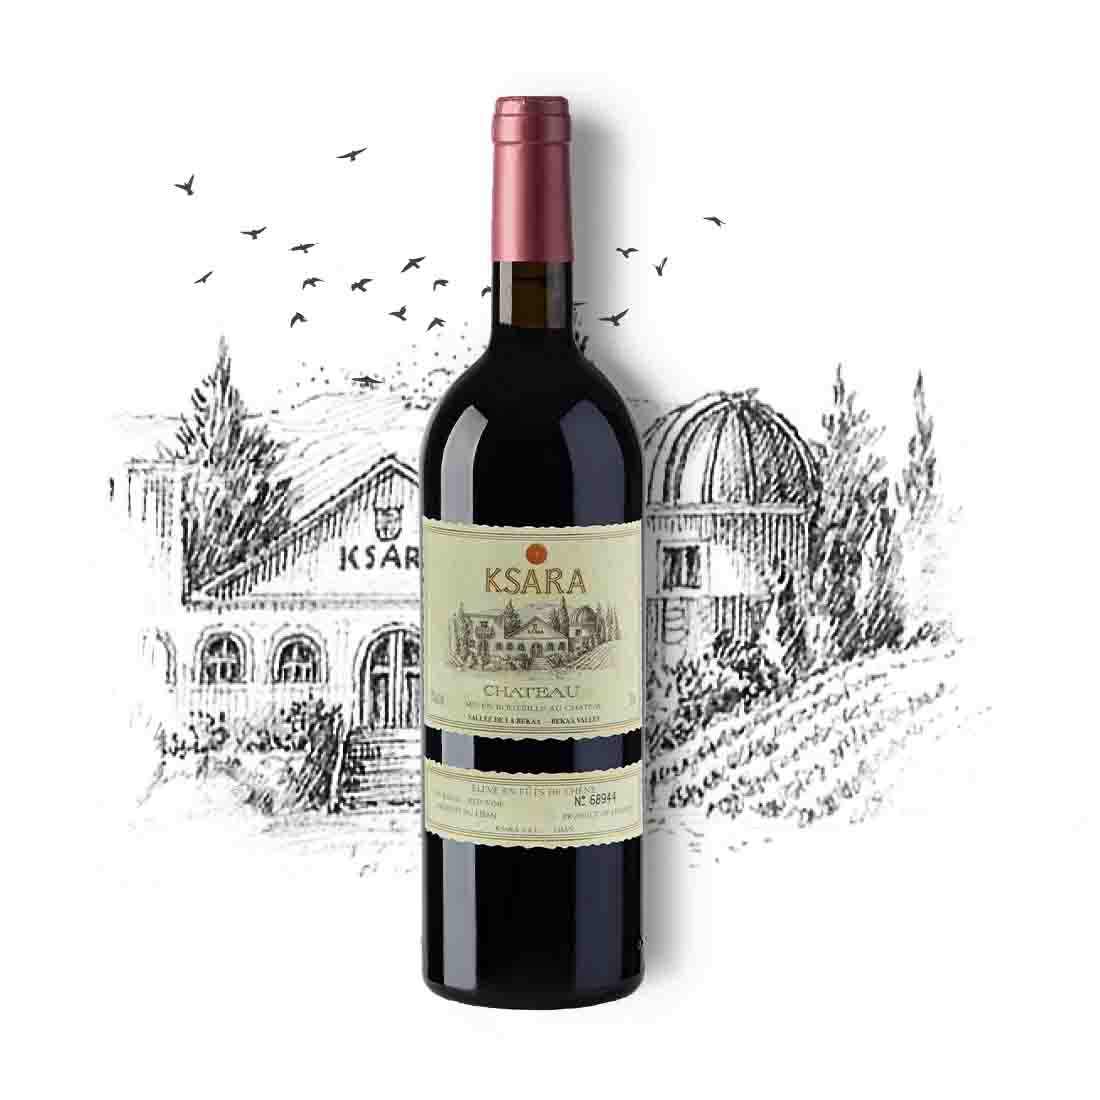 Chateau ksara award winning magnum Lebanese red wine cabernet sauvignon merlot petit Verdot bekaa